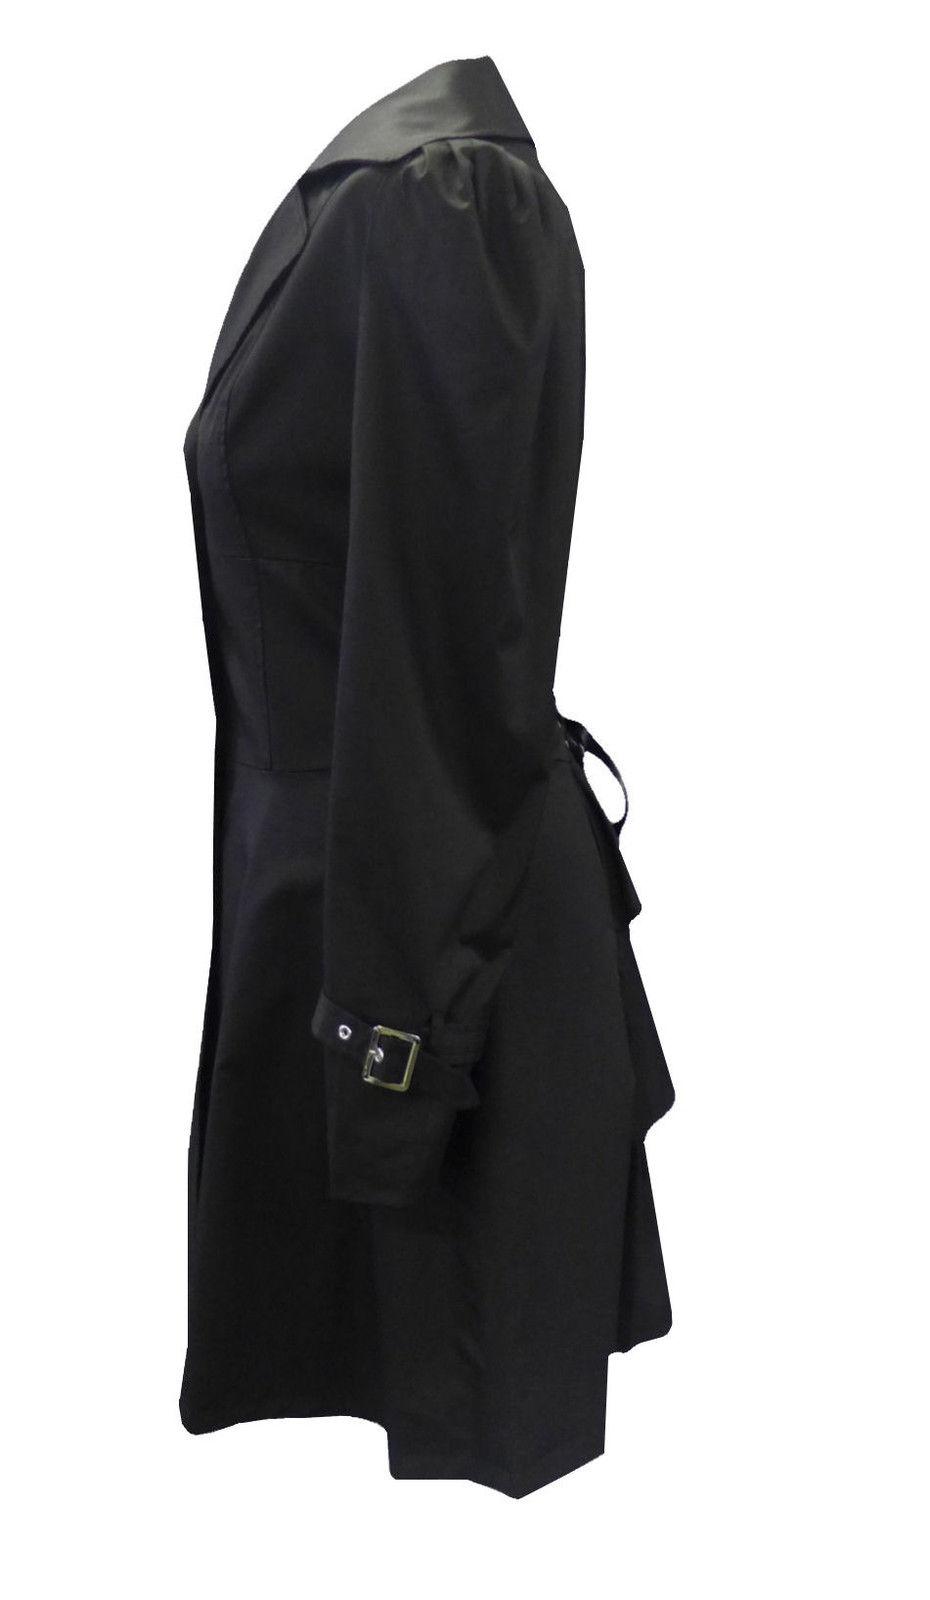 rebelsmarket_women_gothic_victorian_corset_riding_jacket_black_gothic_steampunk_coat__coats_3.jpg